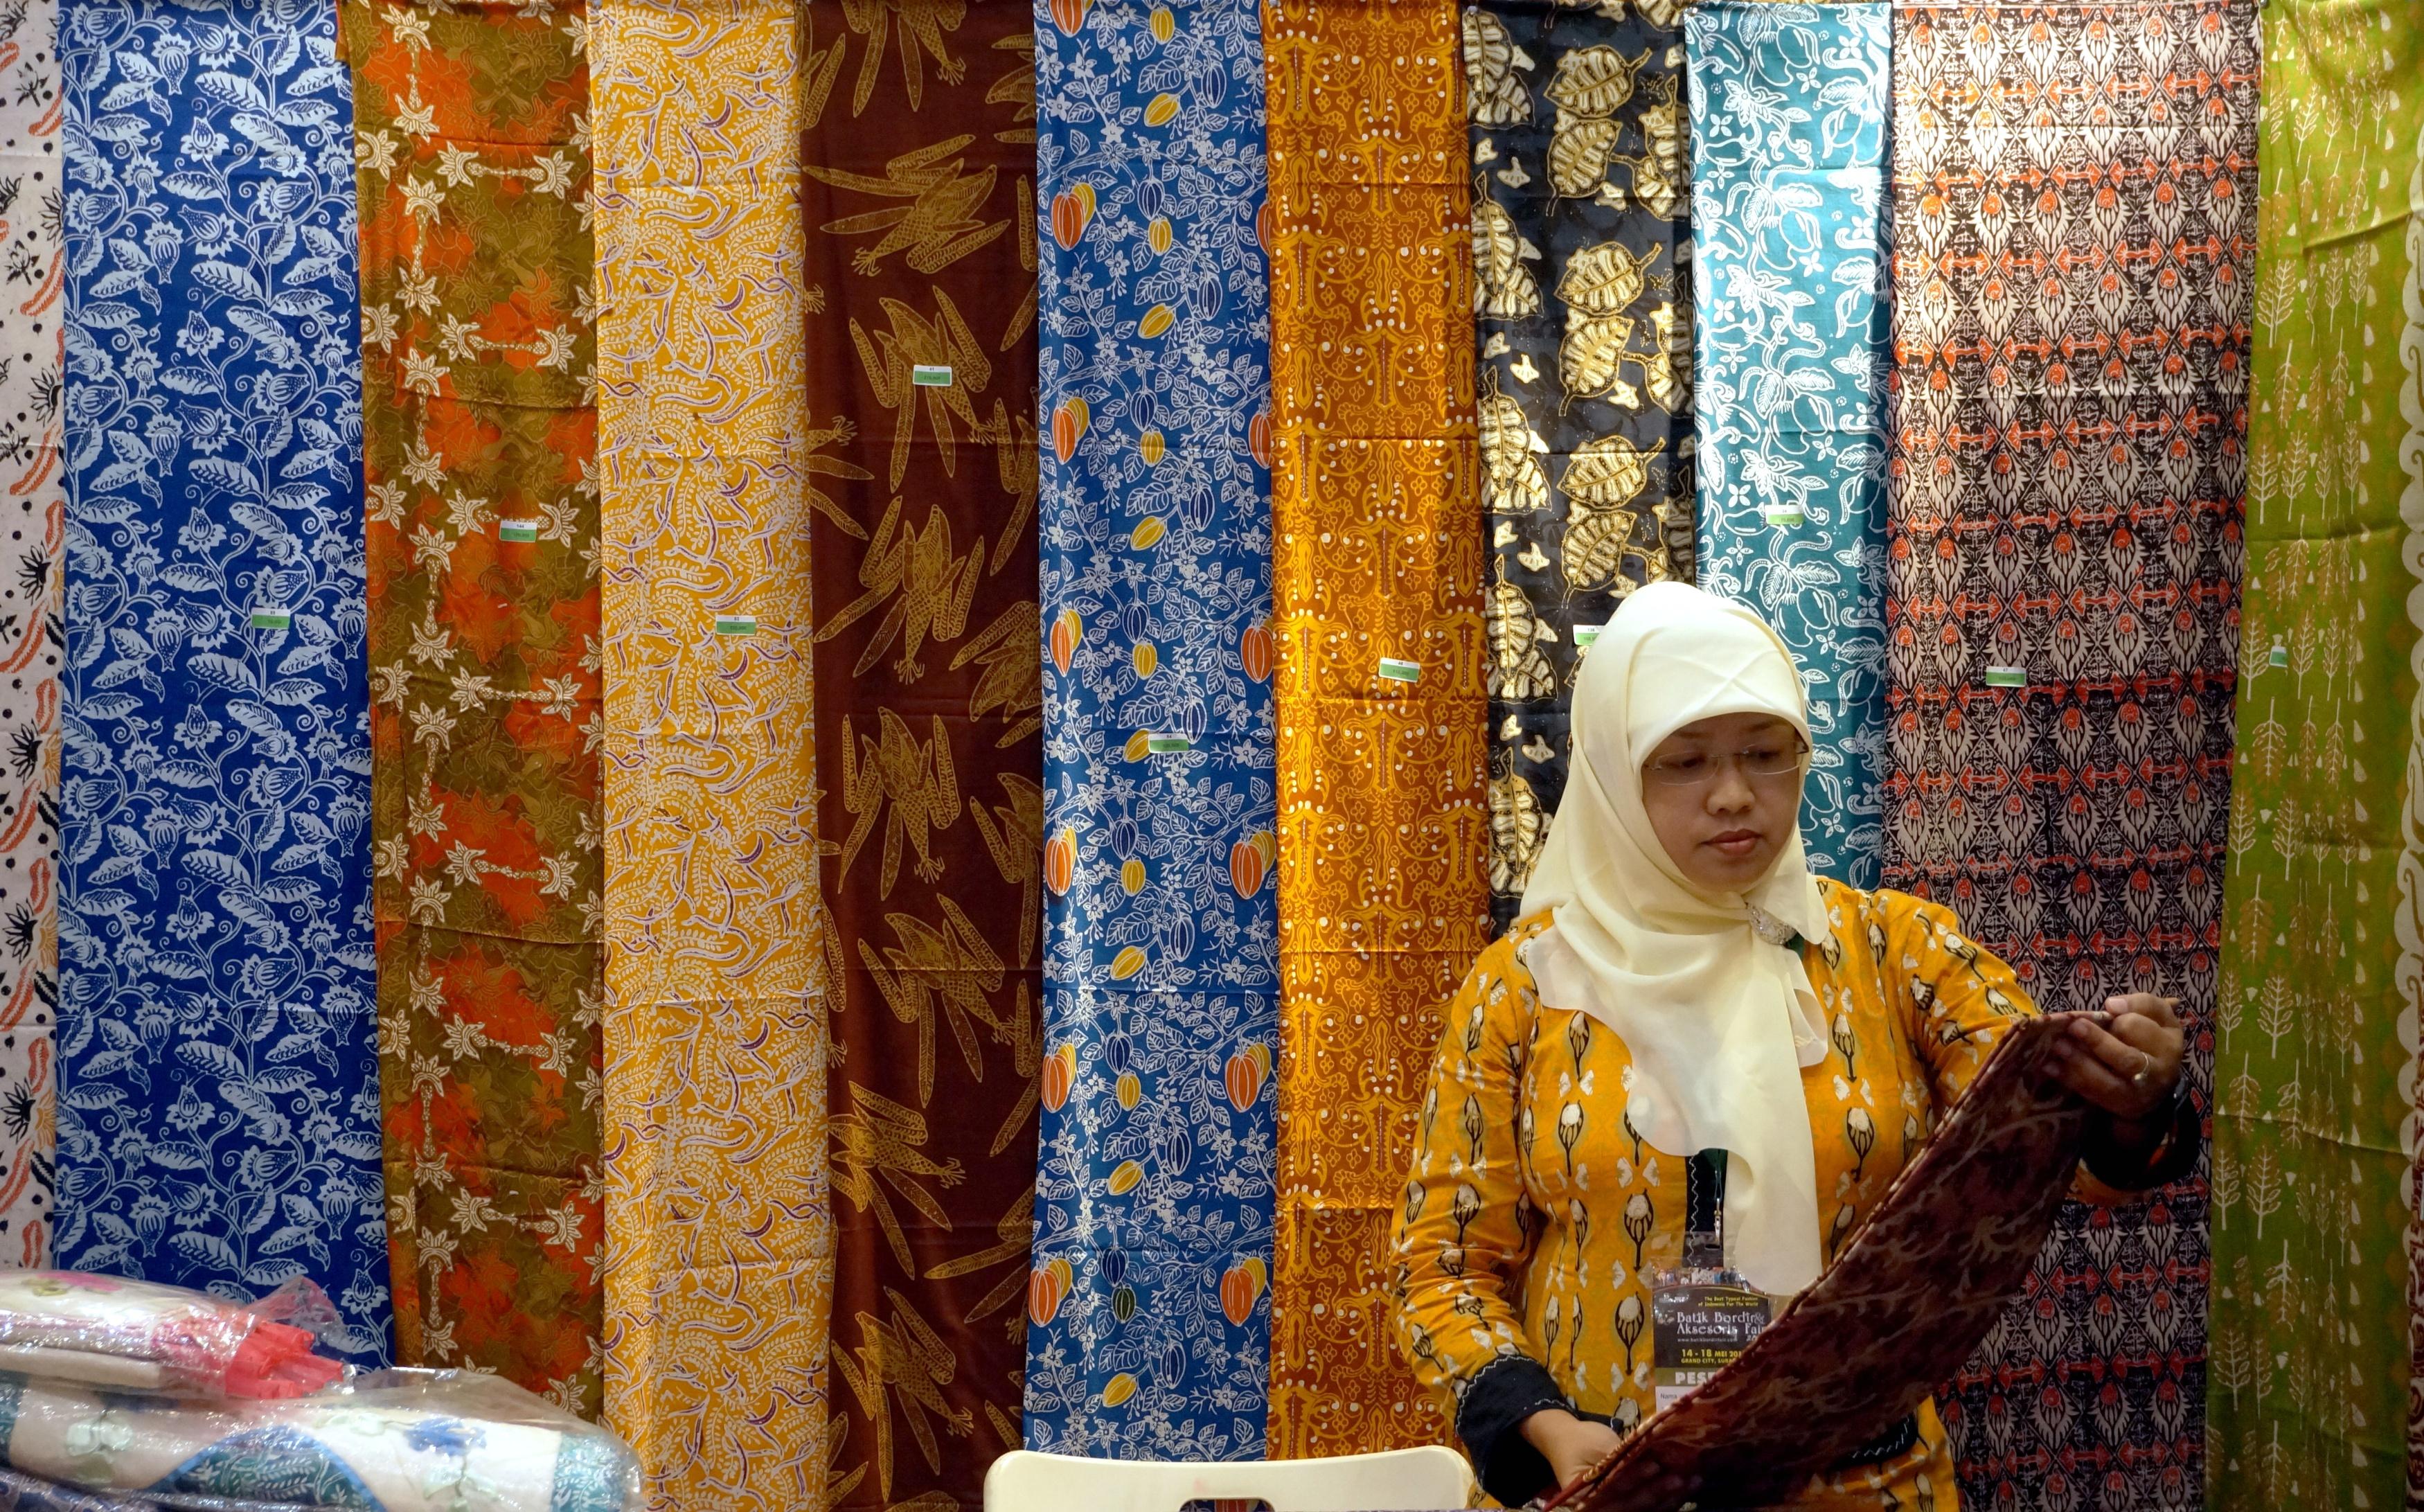 batik, pesan batik, bati surabaya, rumah batik surabaya, rumah batik jawa timur, dolaners, dolan dolen pesan batik via beritadaerah - Dolan Dolen